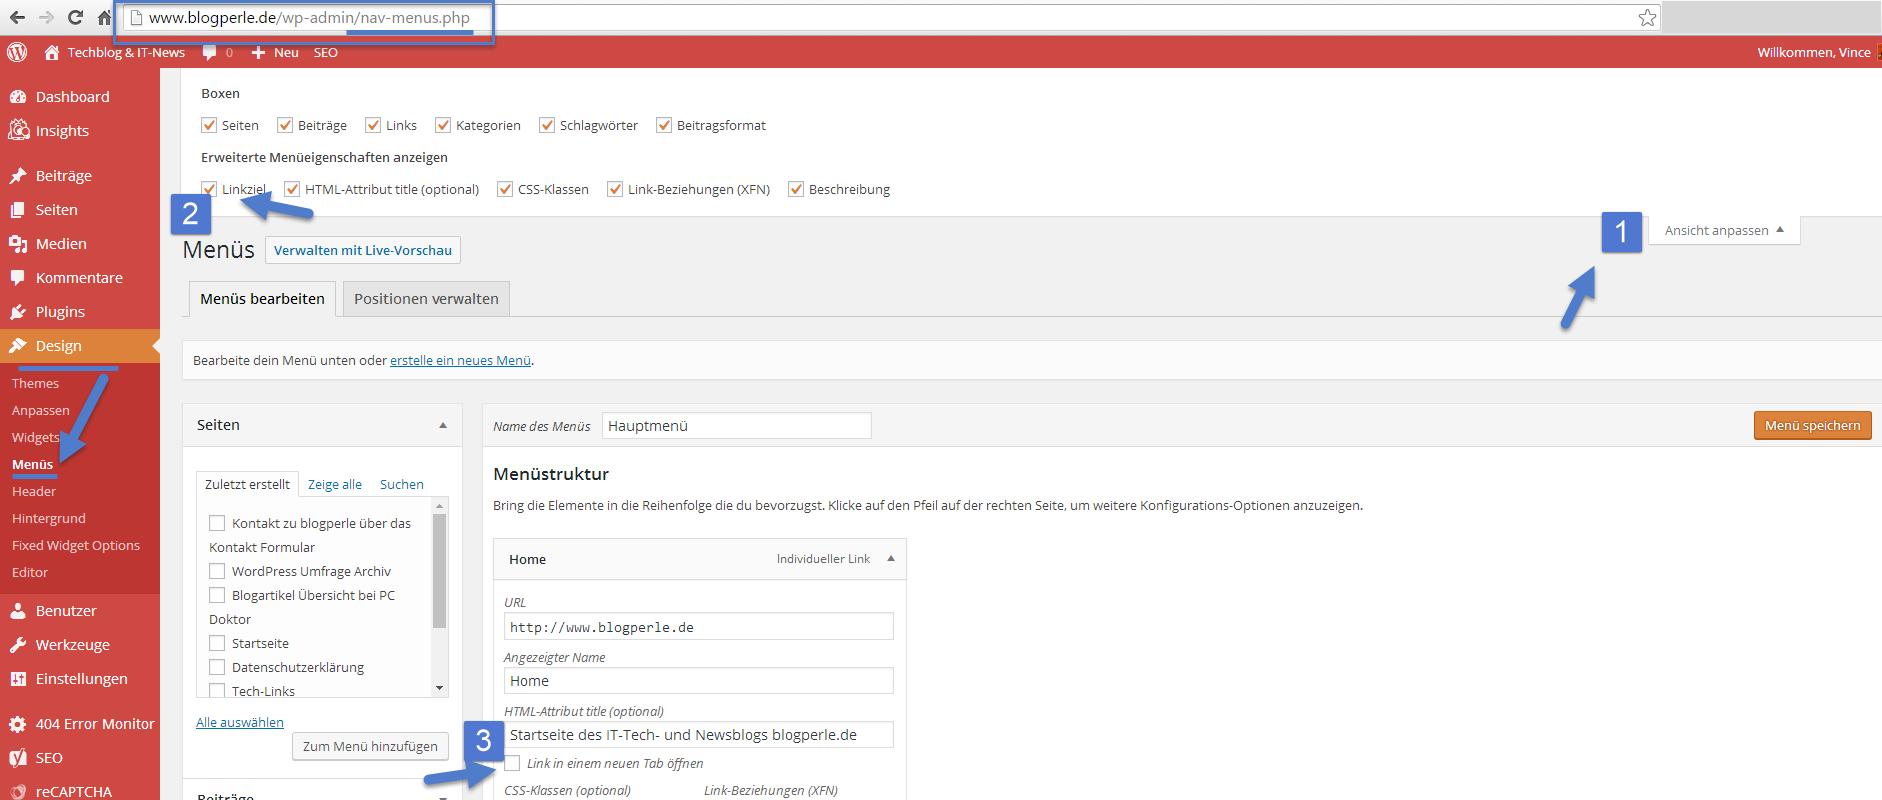 Wordpress Menü Link target blank einbauen